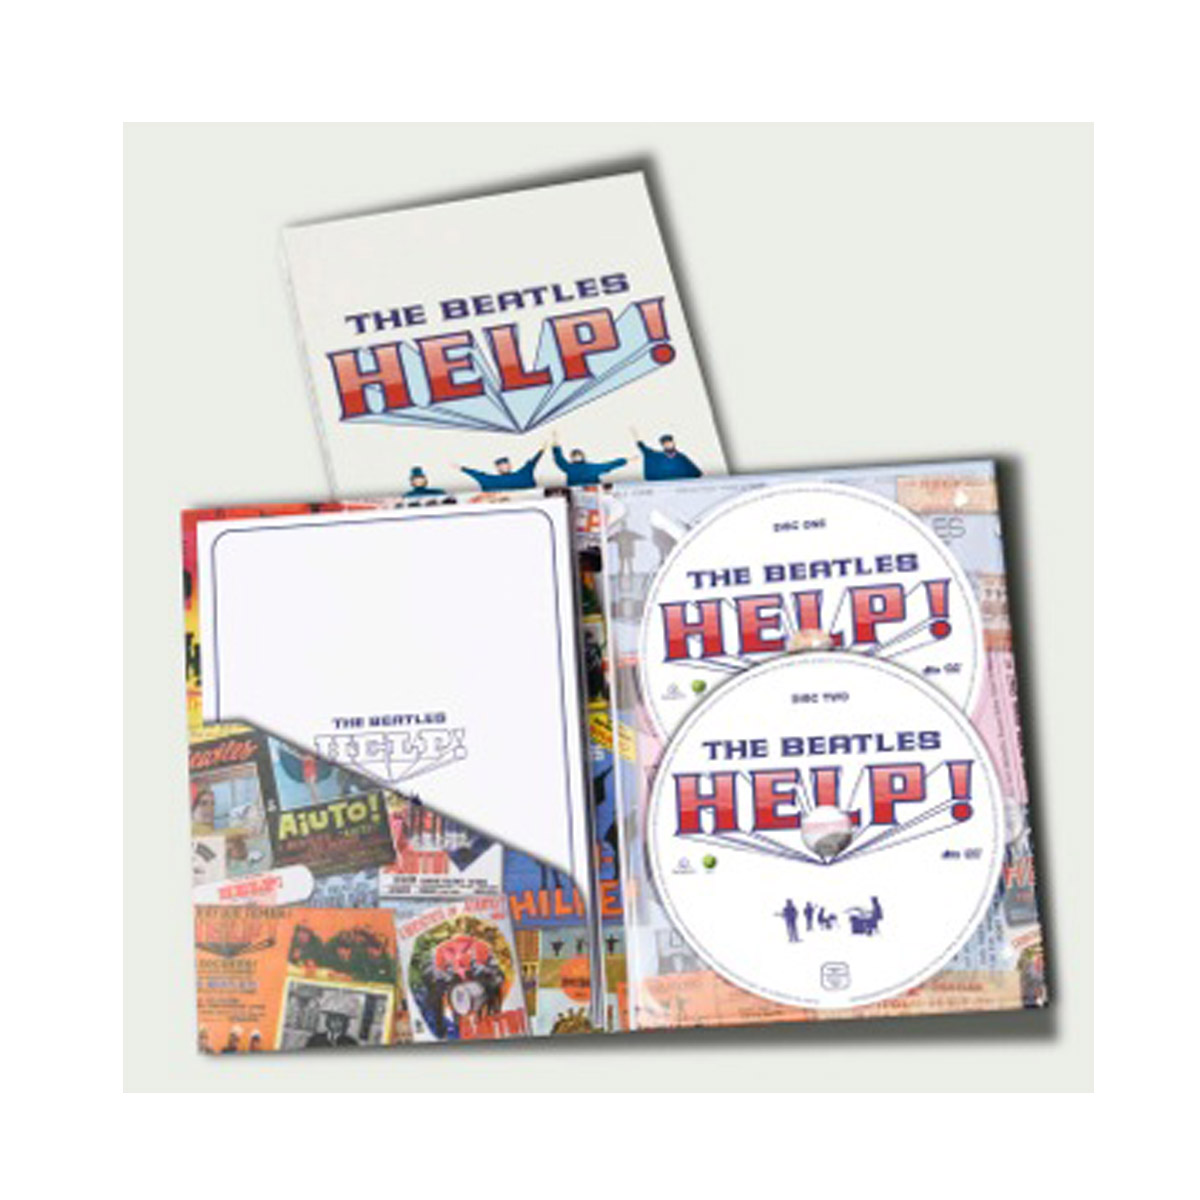 DVD Duplo The Beatles - Help